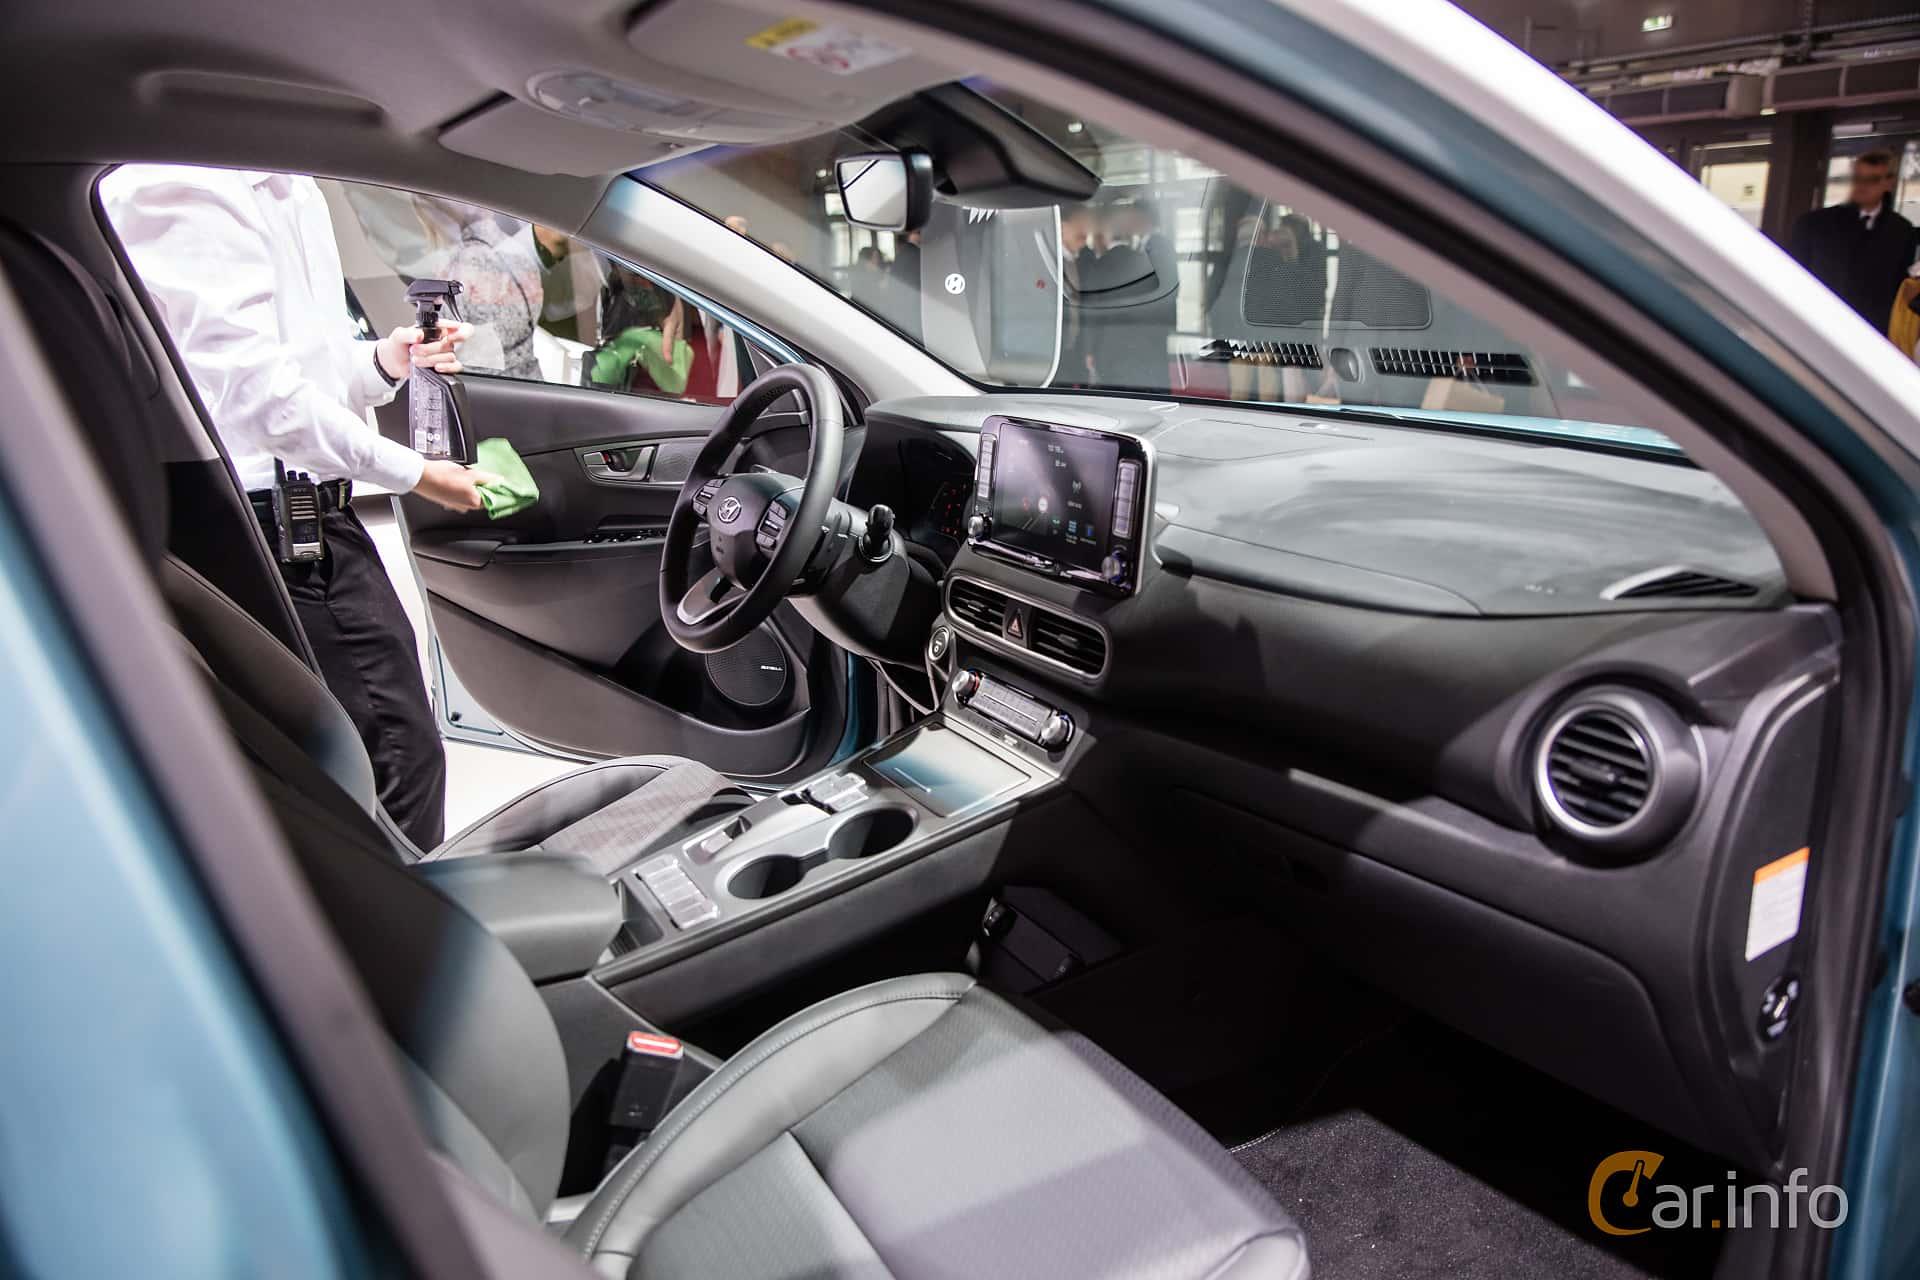 Interior of Hyundai Kona Electric 64 kWh Single Speed, 204ps, 2019 at Paris Motor Show 2018